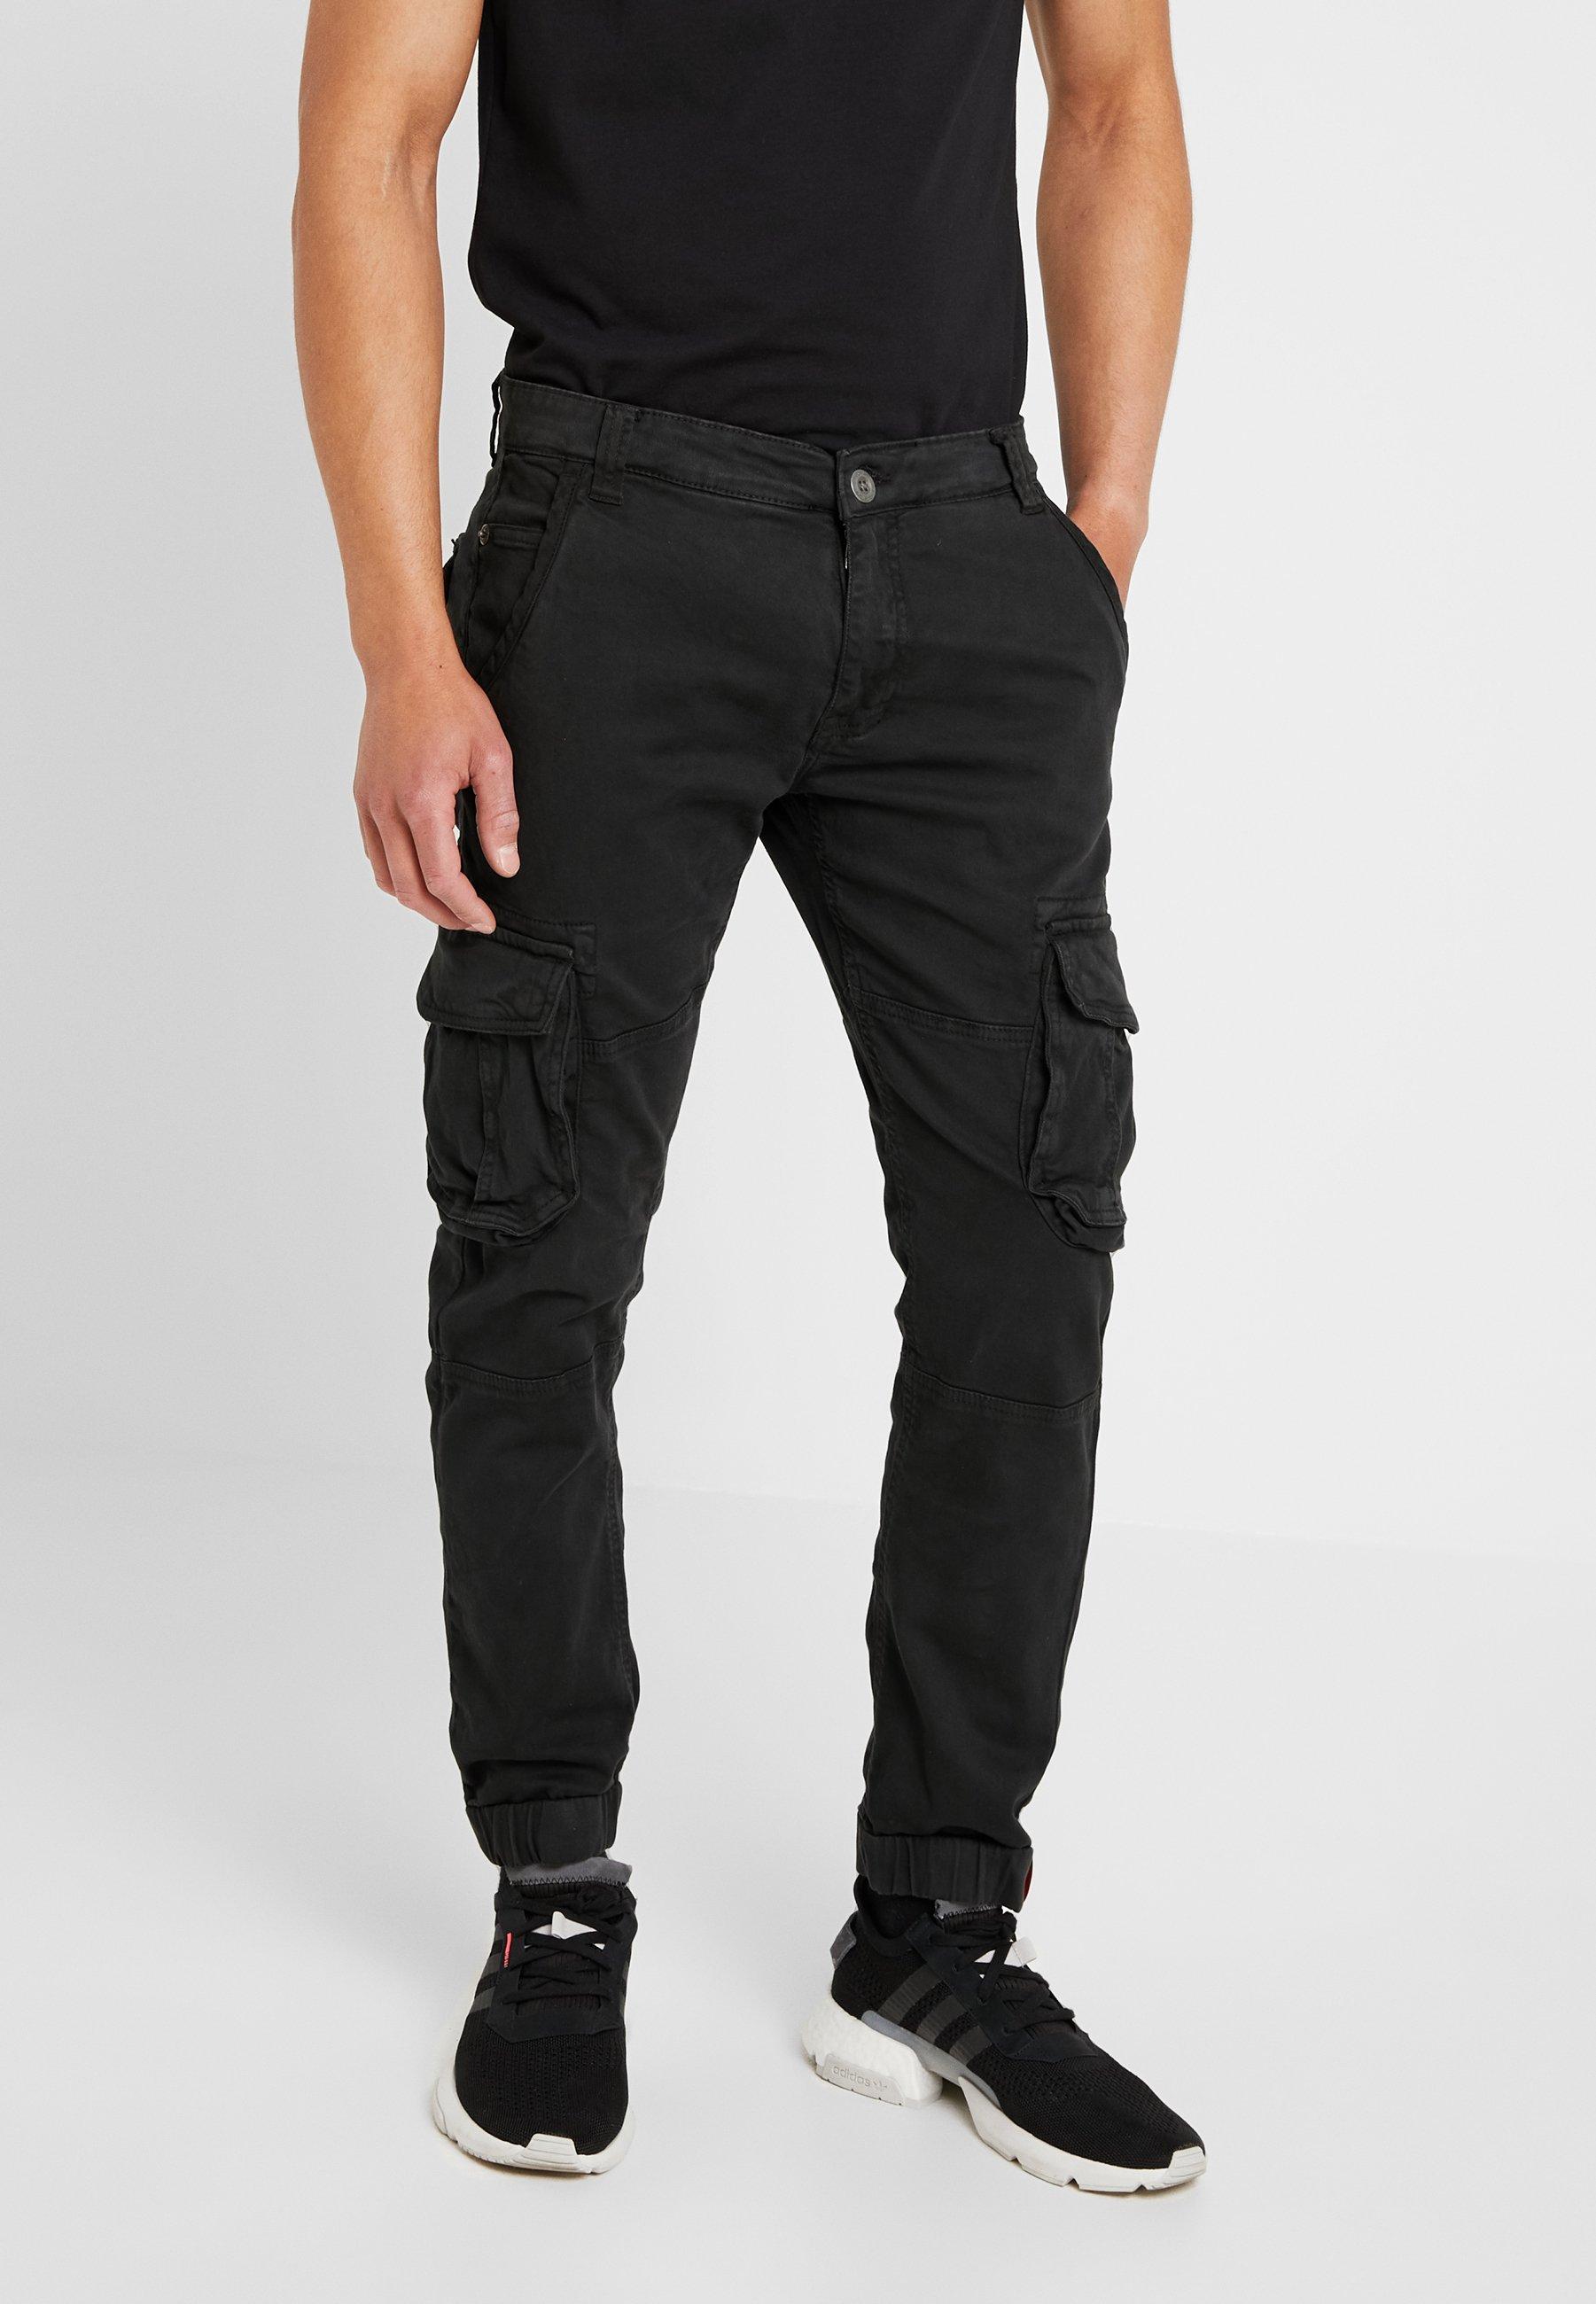 Homme ARMY PANT - Pantalon cargo